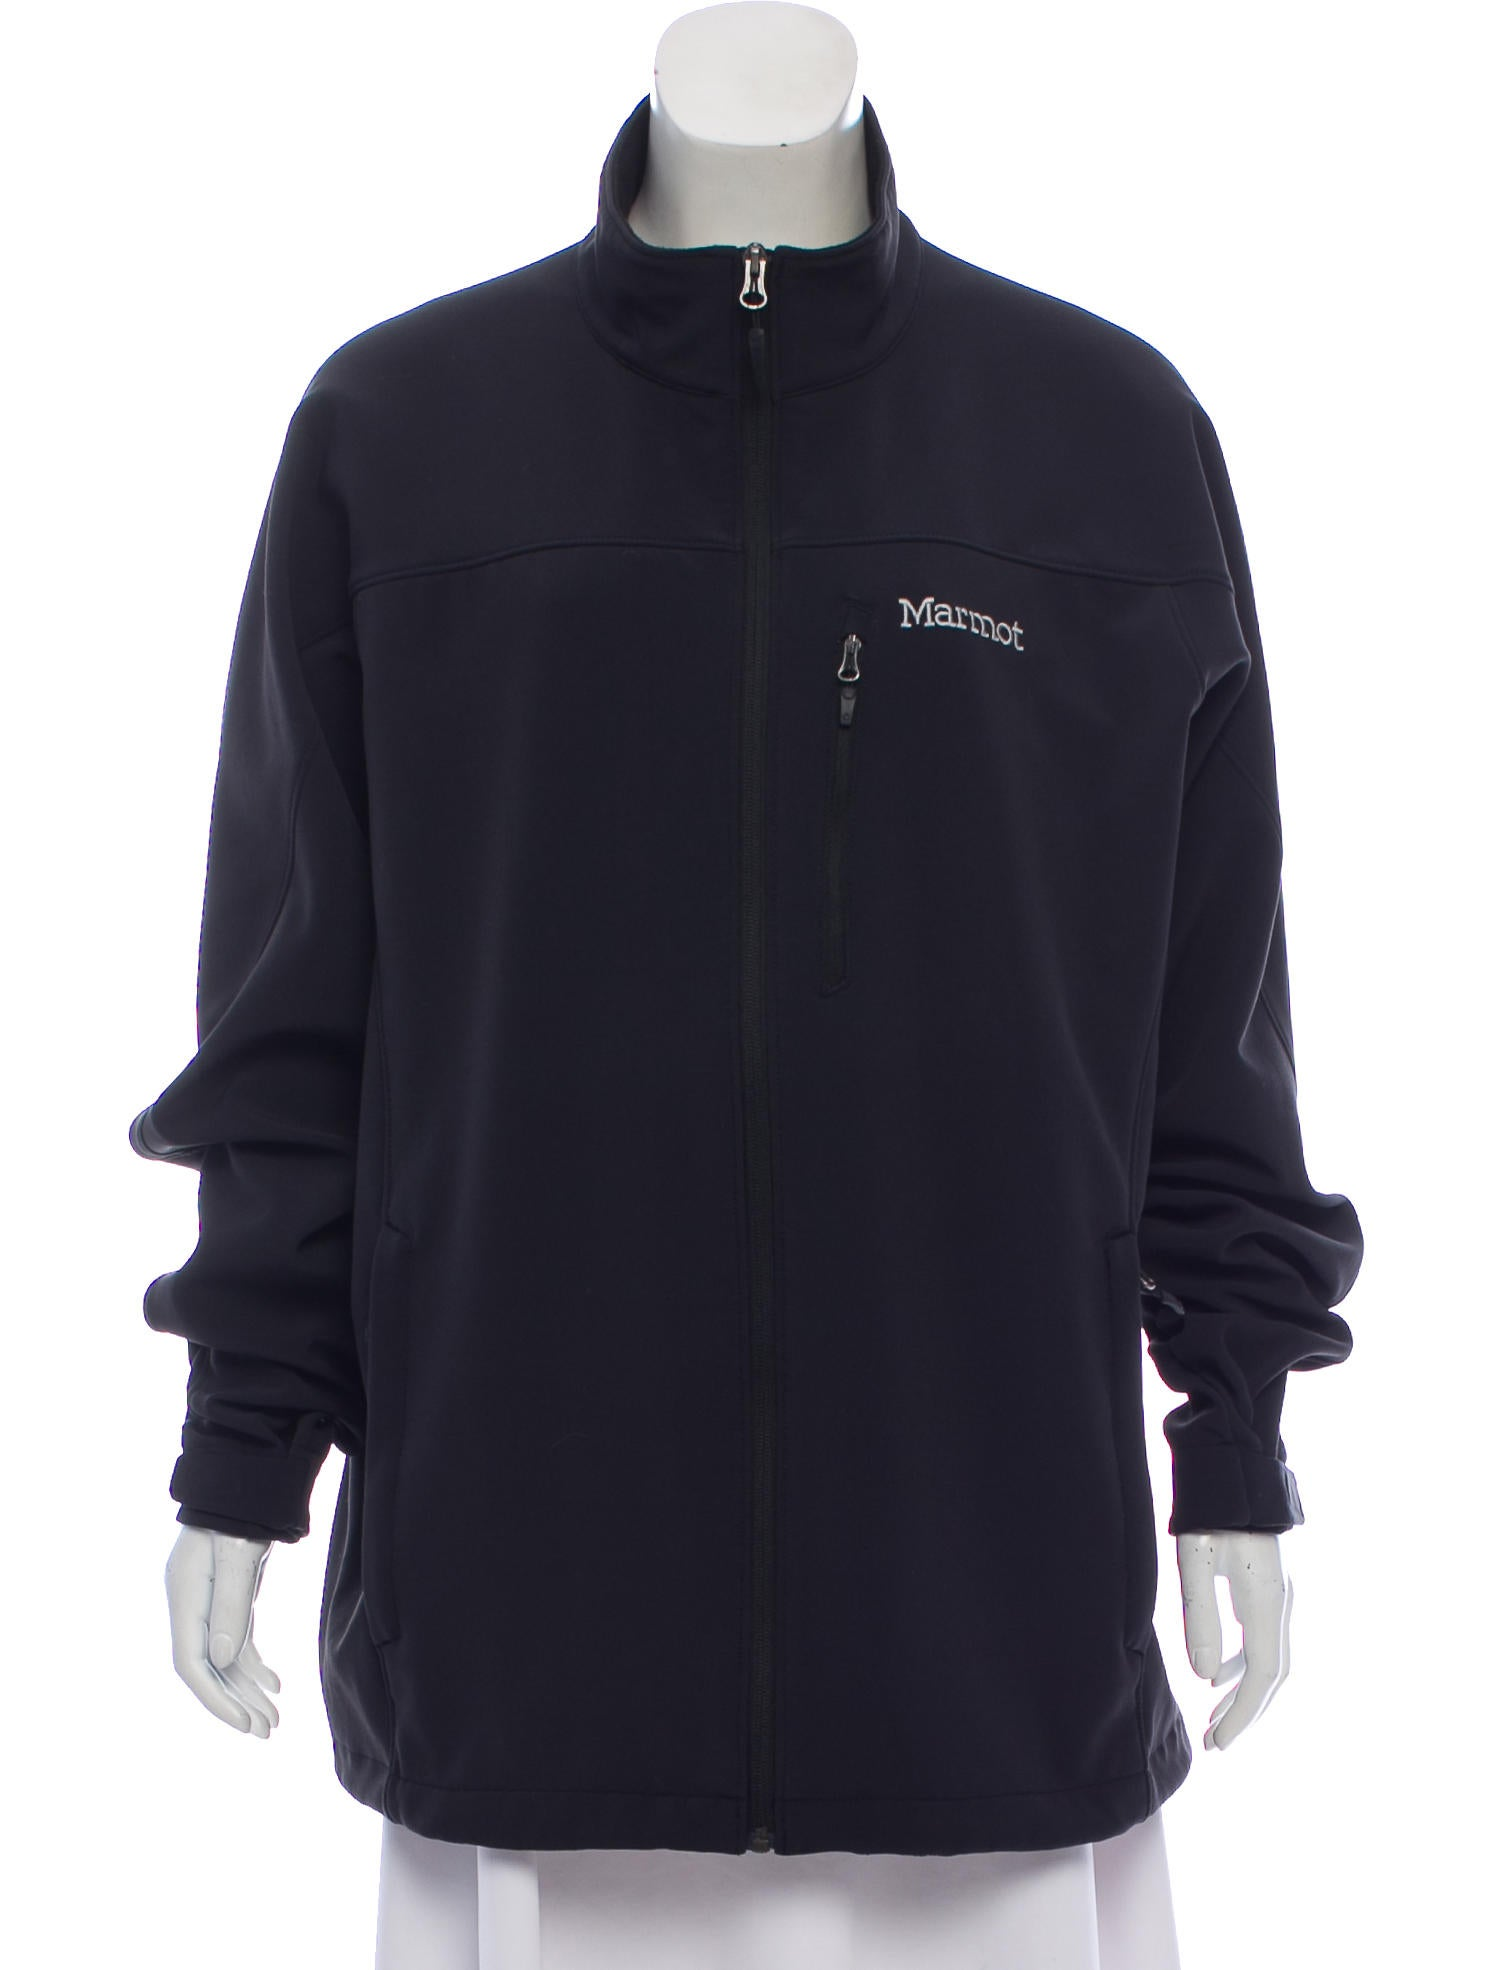 Logo Fleece Lined Jacket